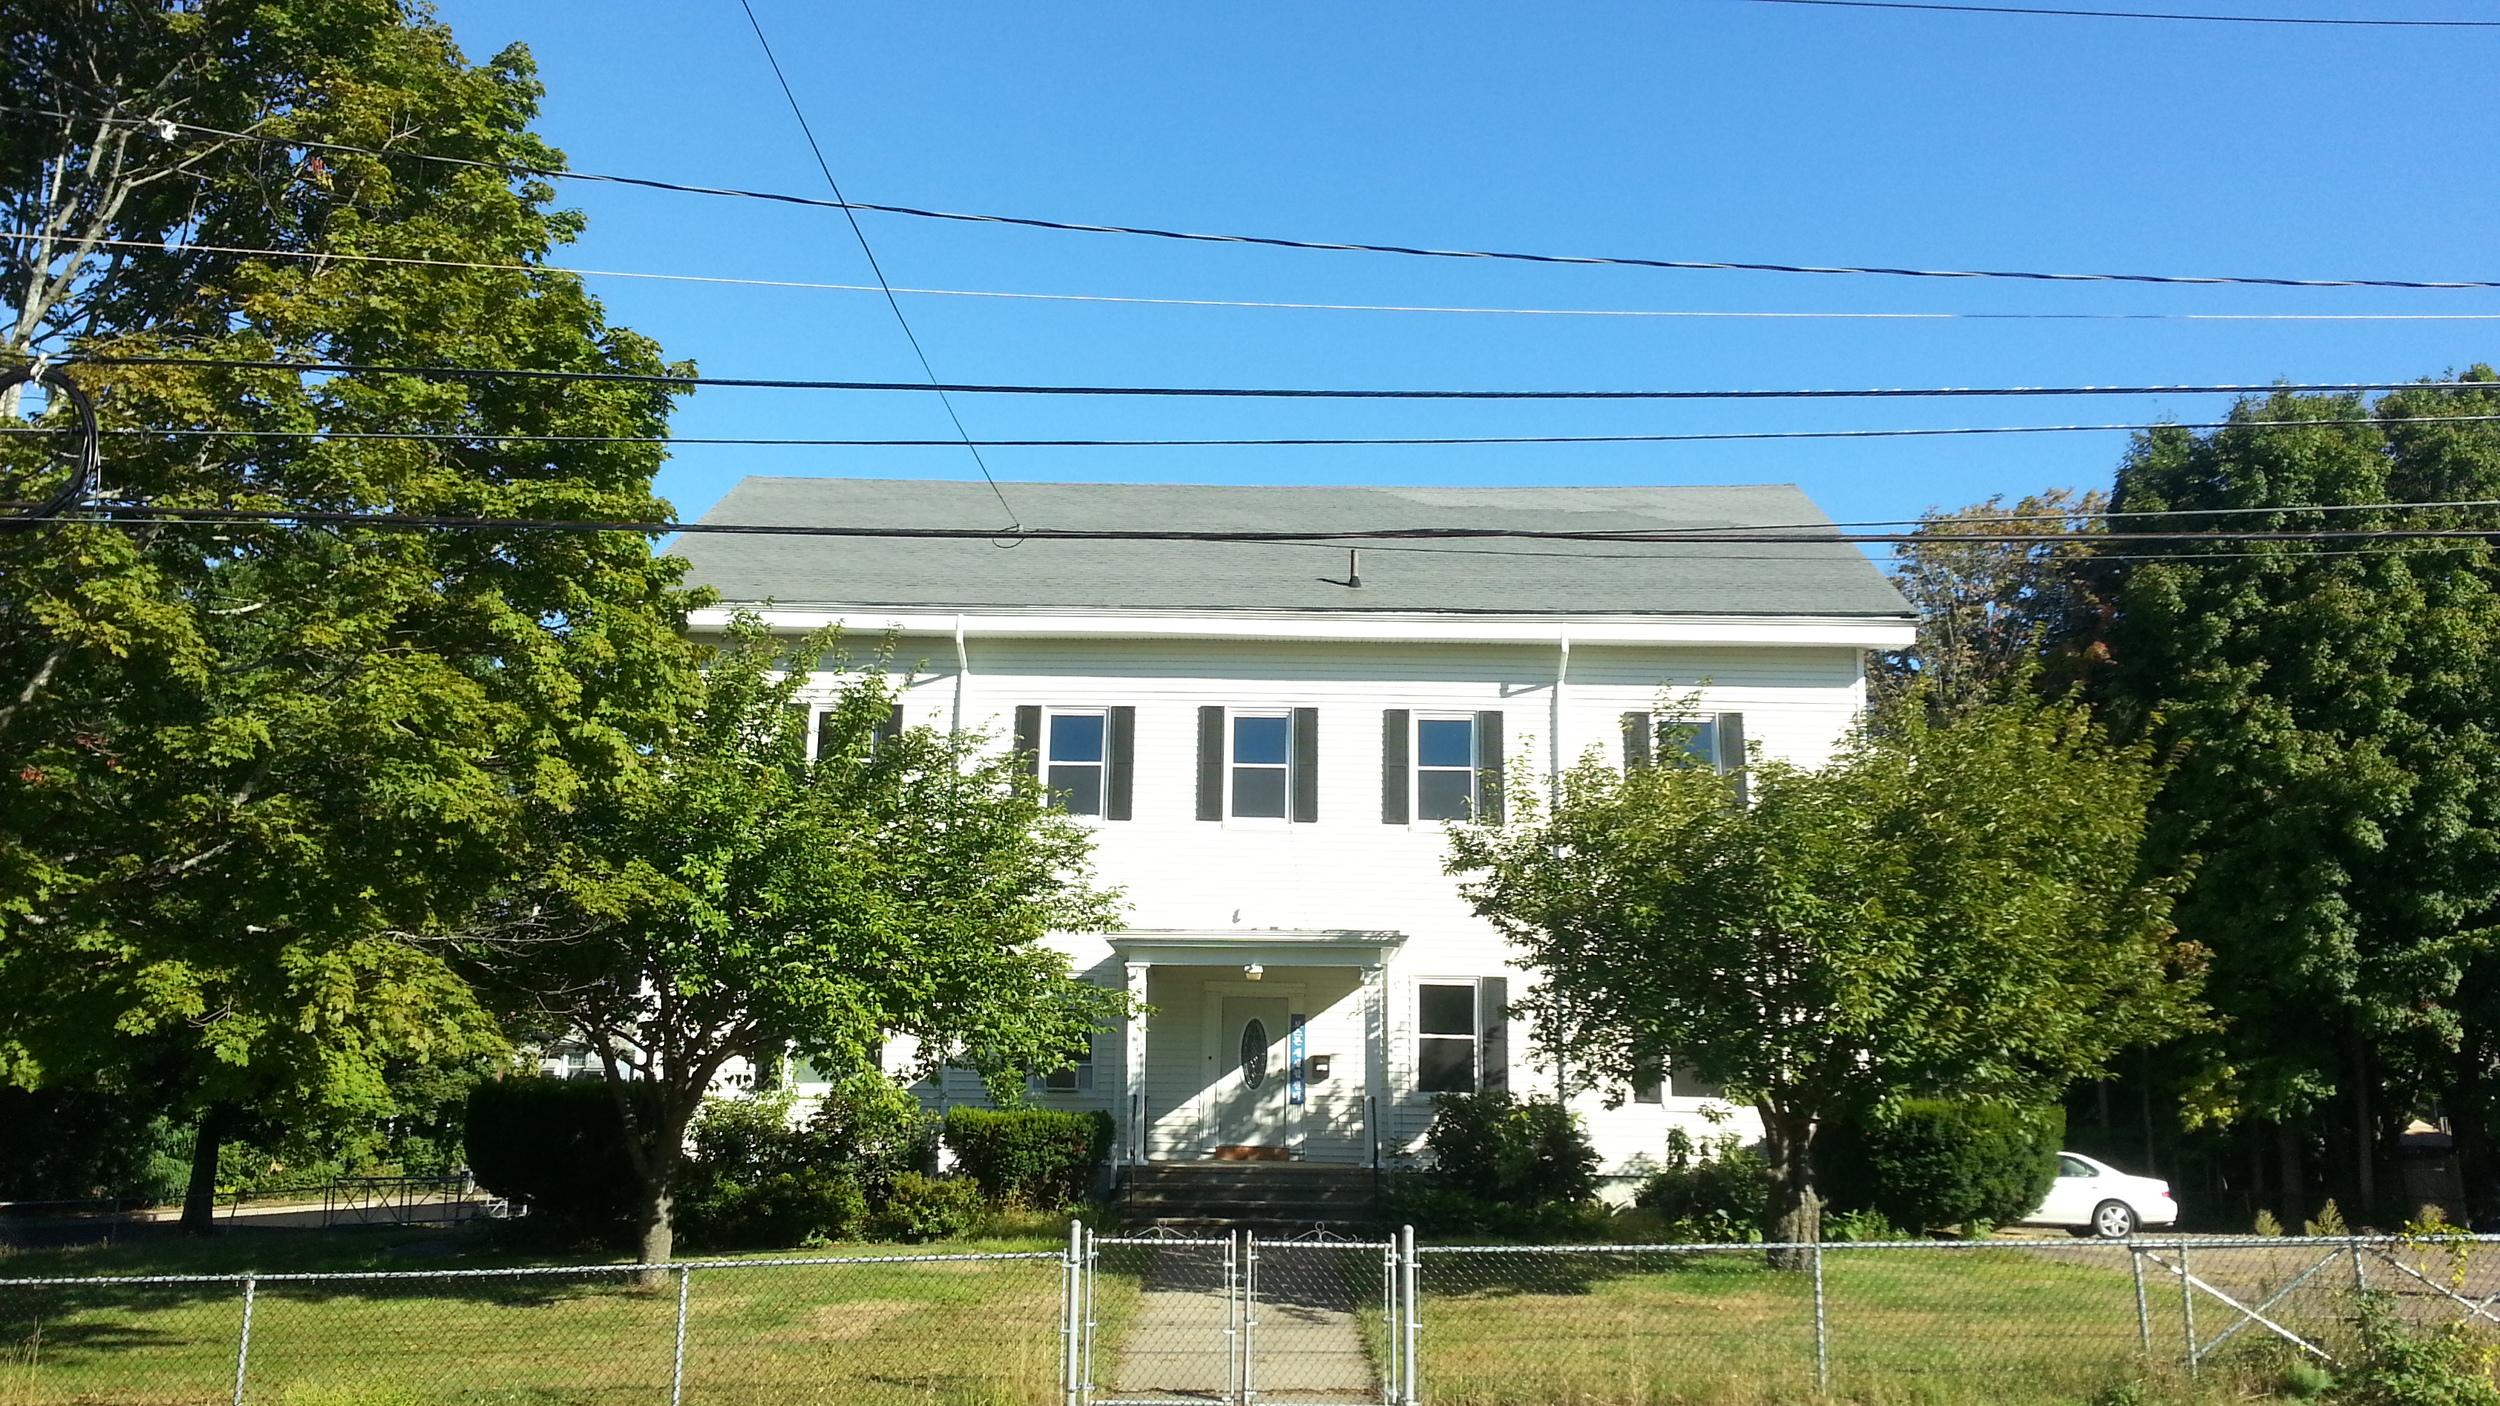 Boston Korean Seventh-day Adventist Church